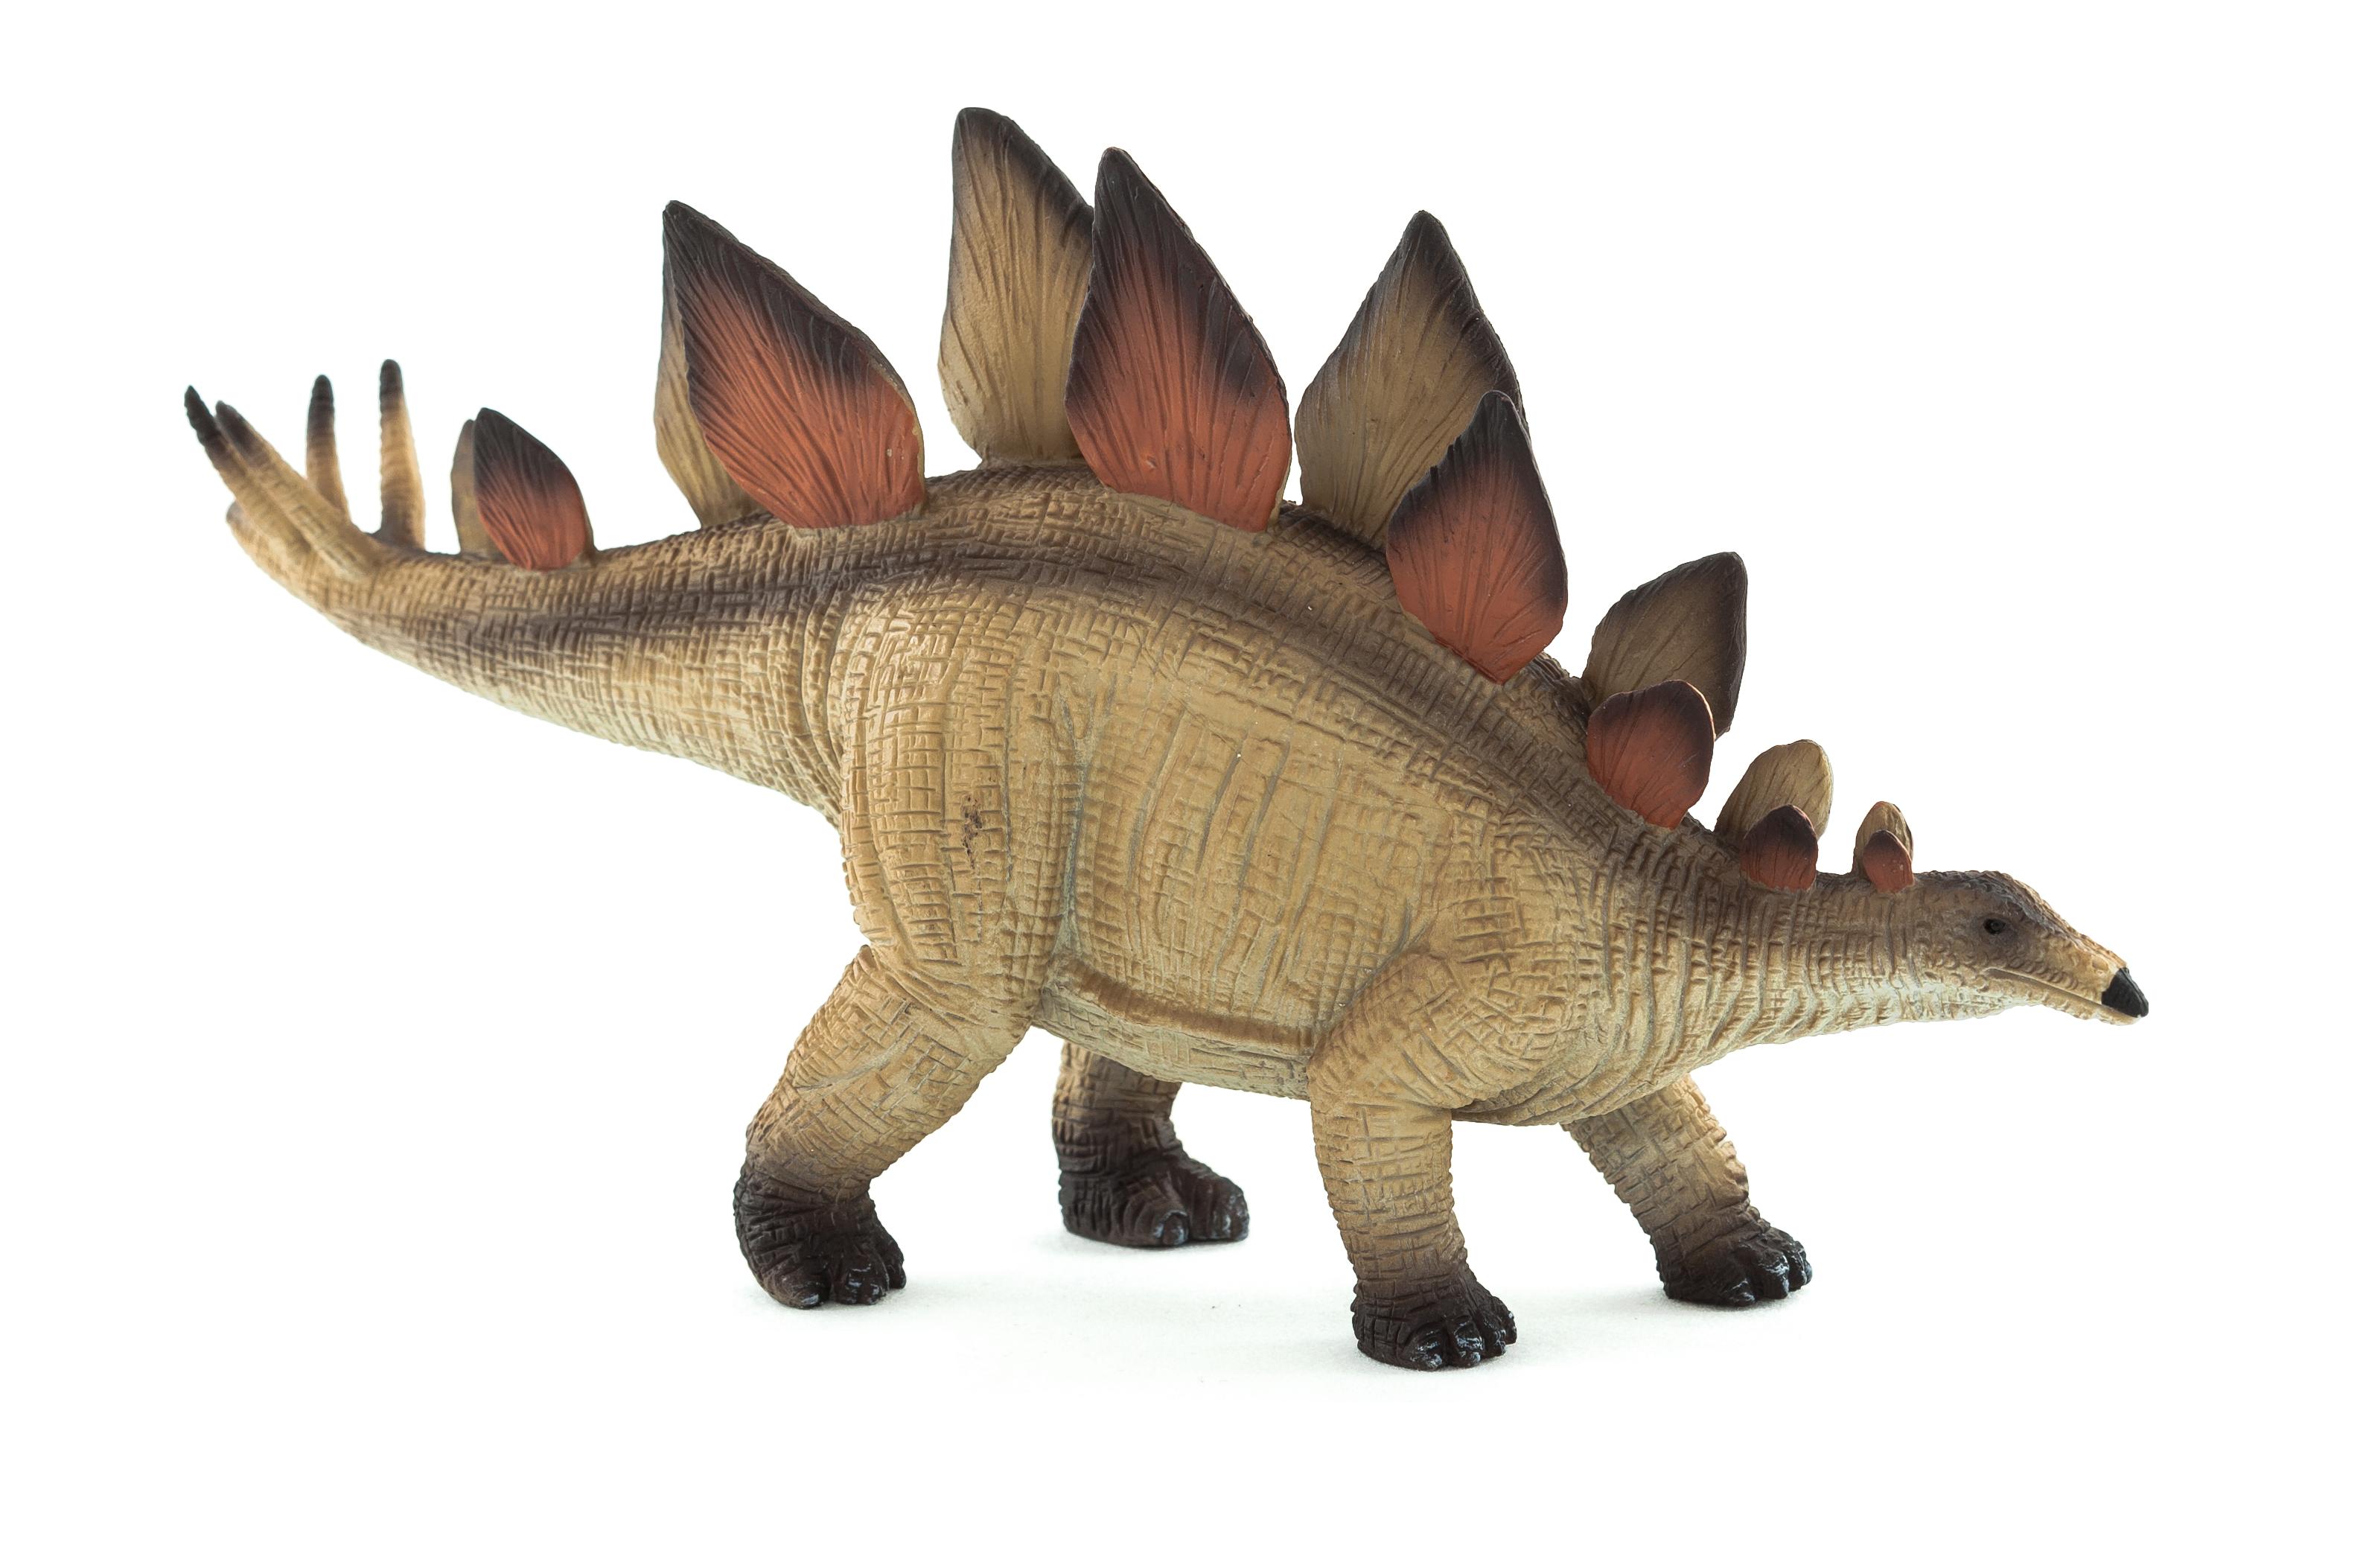 HD Quality Wallpaper   Collection: Animal, 3174x2106 Stegosaurus